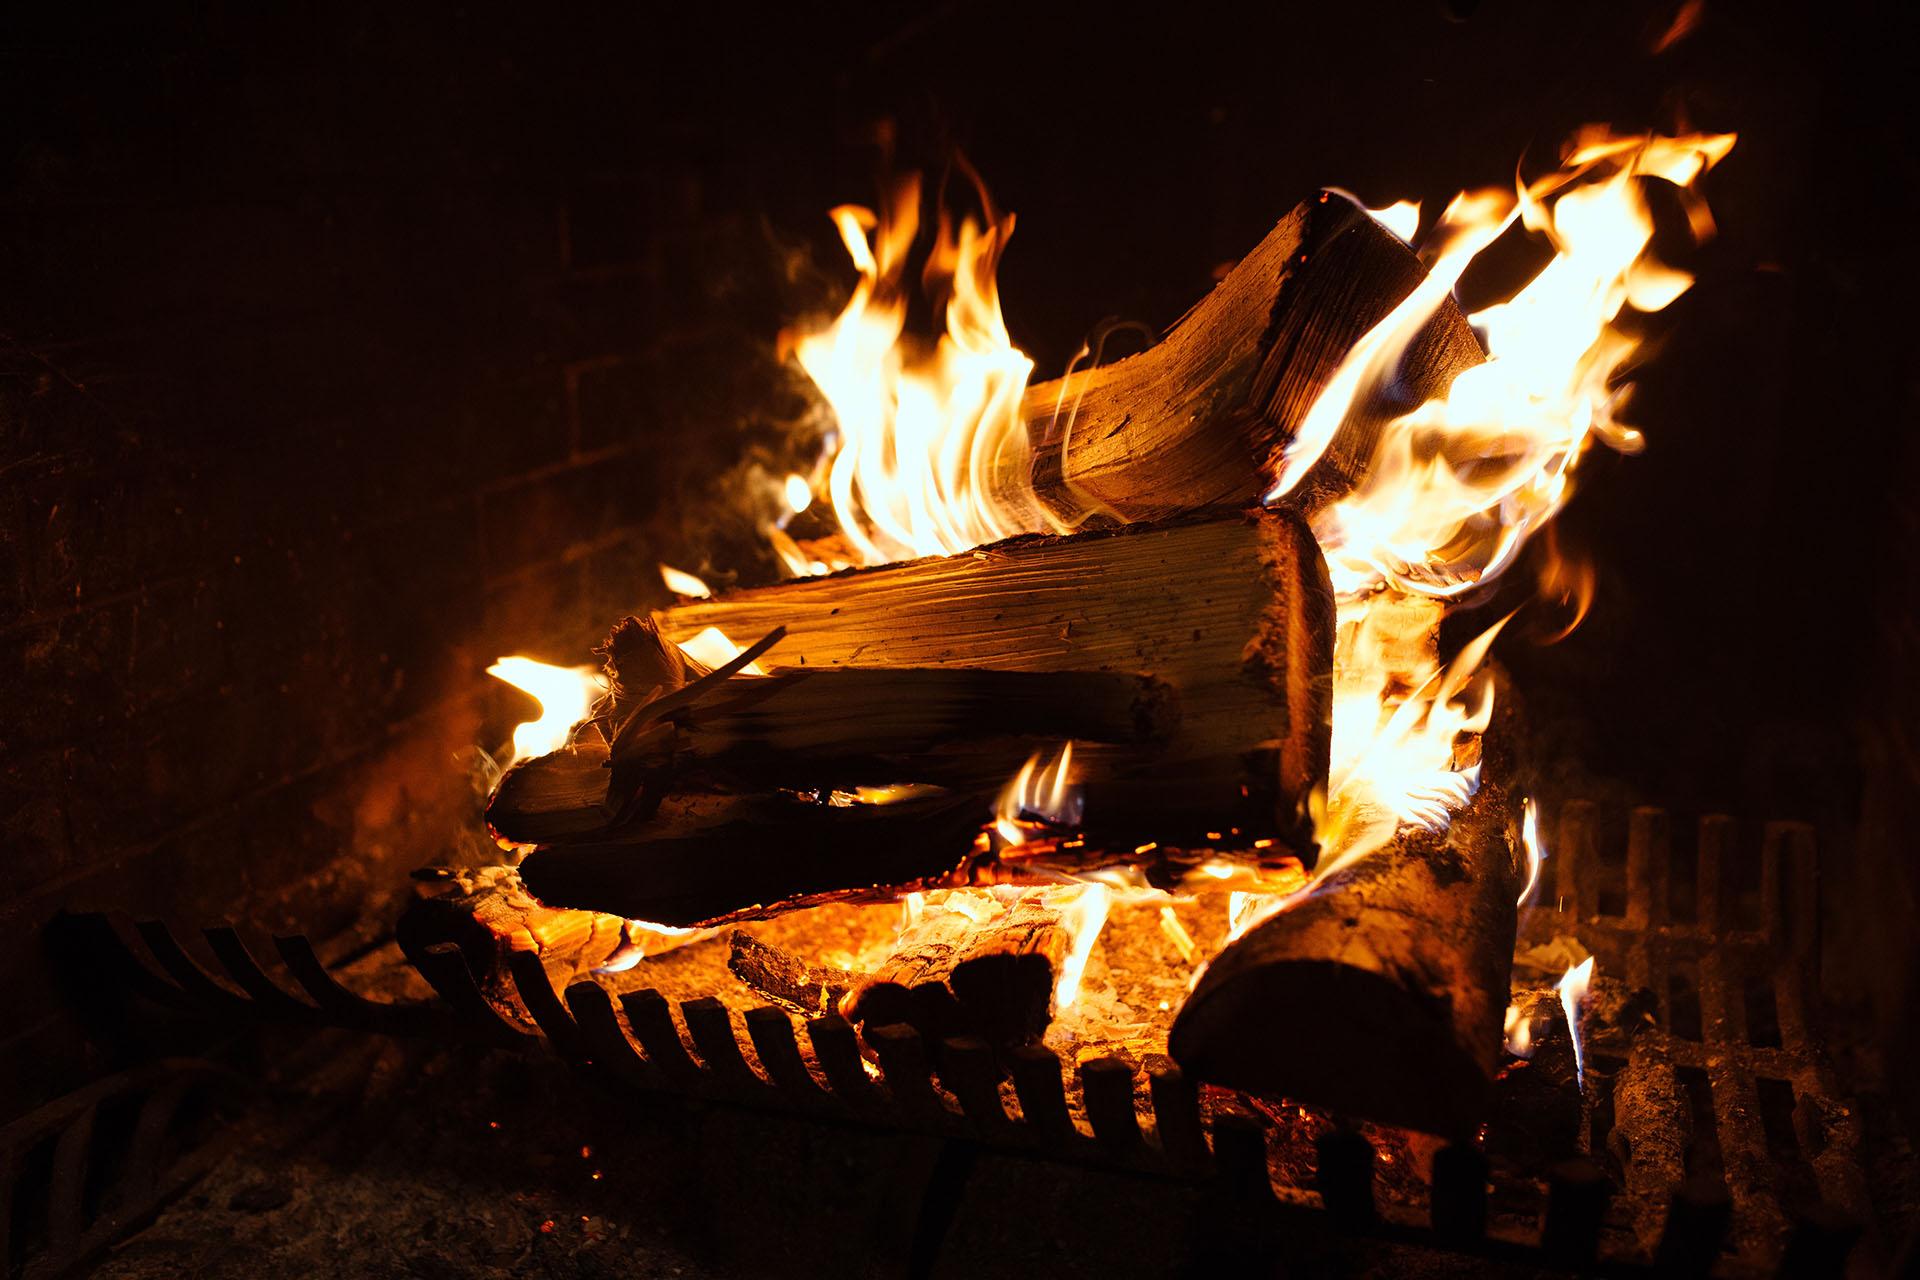 consejos chimenea argemi consells llar de foc